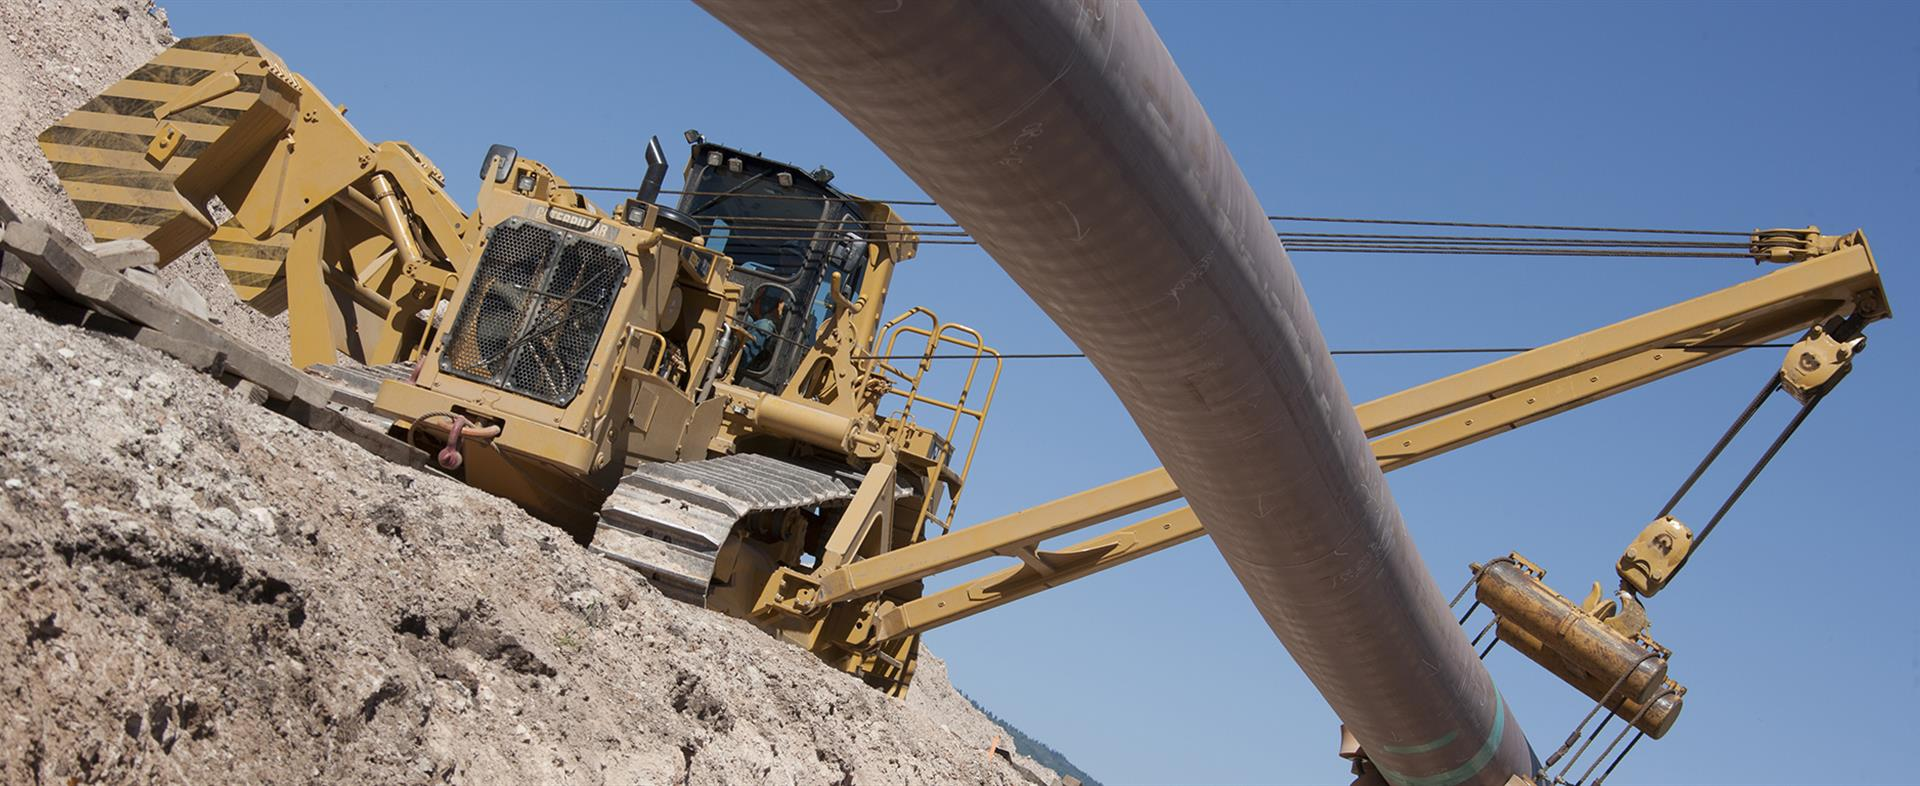 572R2 pipelayer sideboom pipeline construction equipment